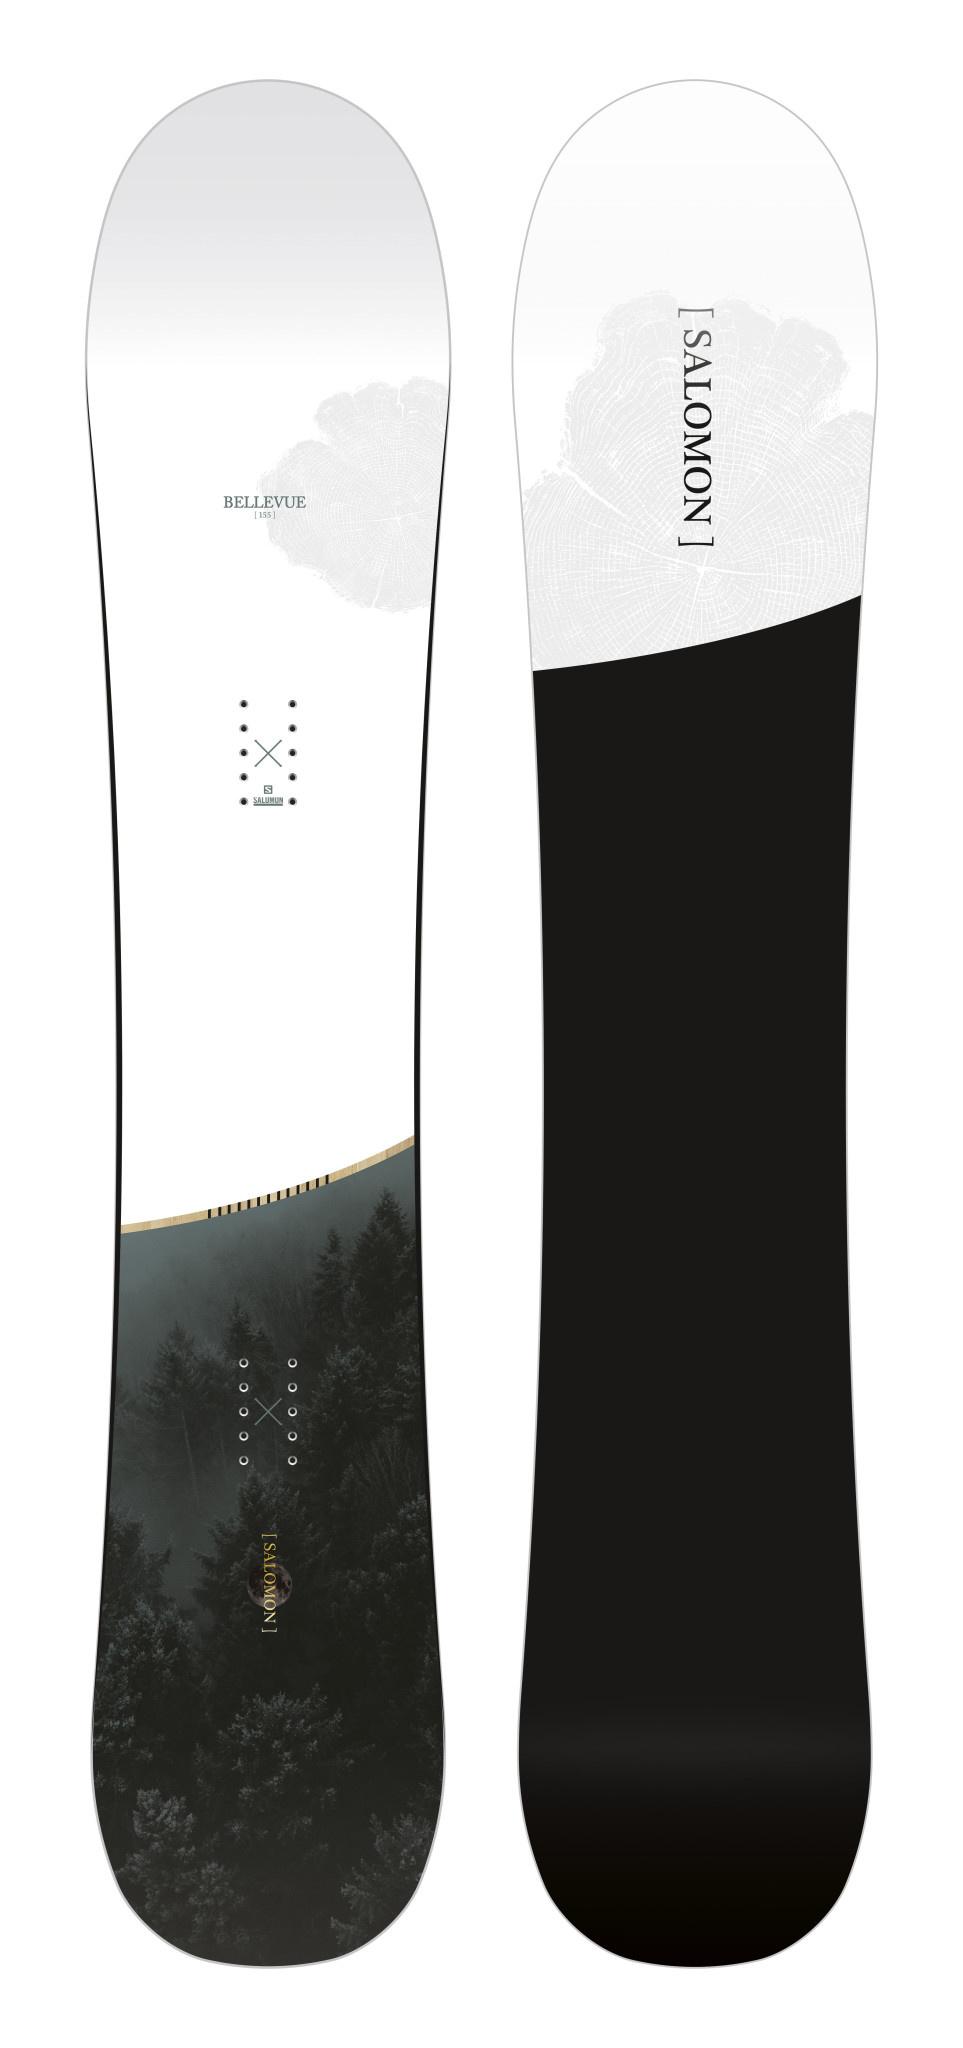 SALOMON Salomon Women's Bellevue Snowboard (2021)